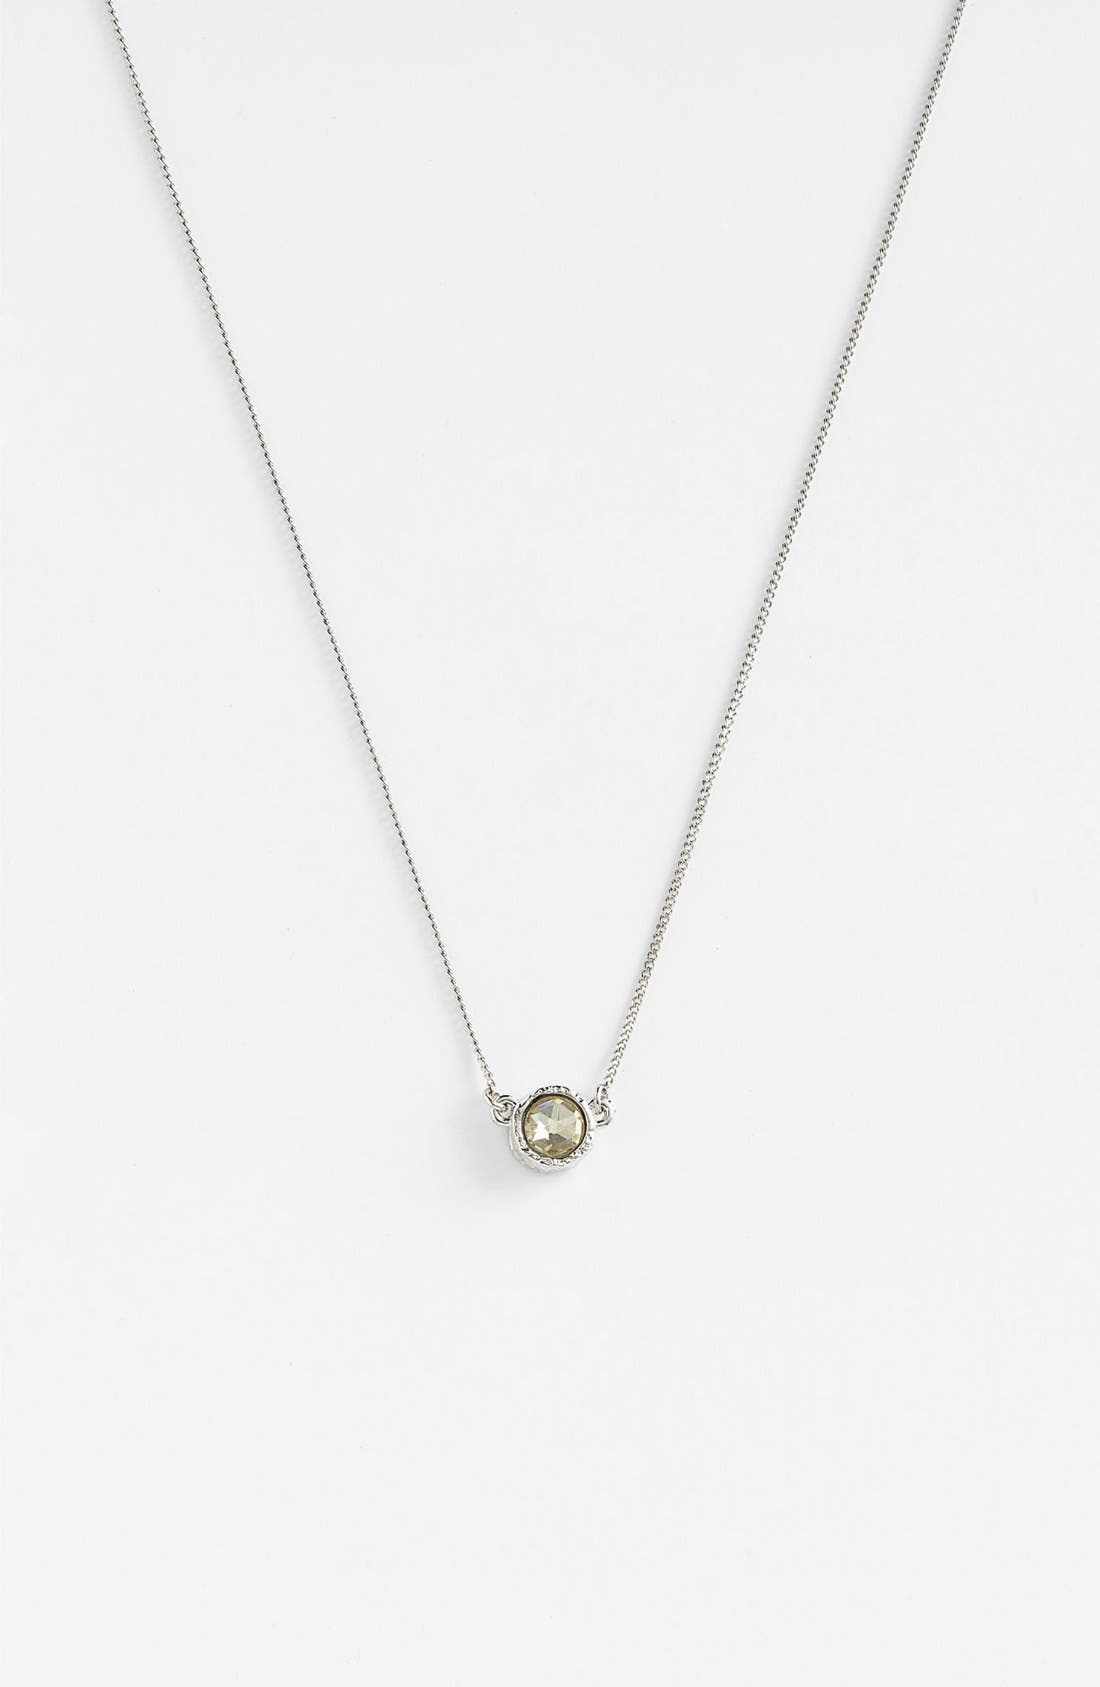 Alternate Image 1 Selected - MARC BY MARC JACOBS 'Paste & Prints' Pendant Necklace